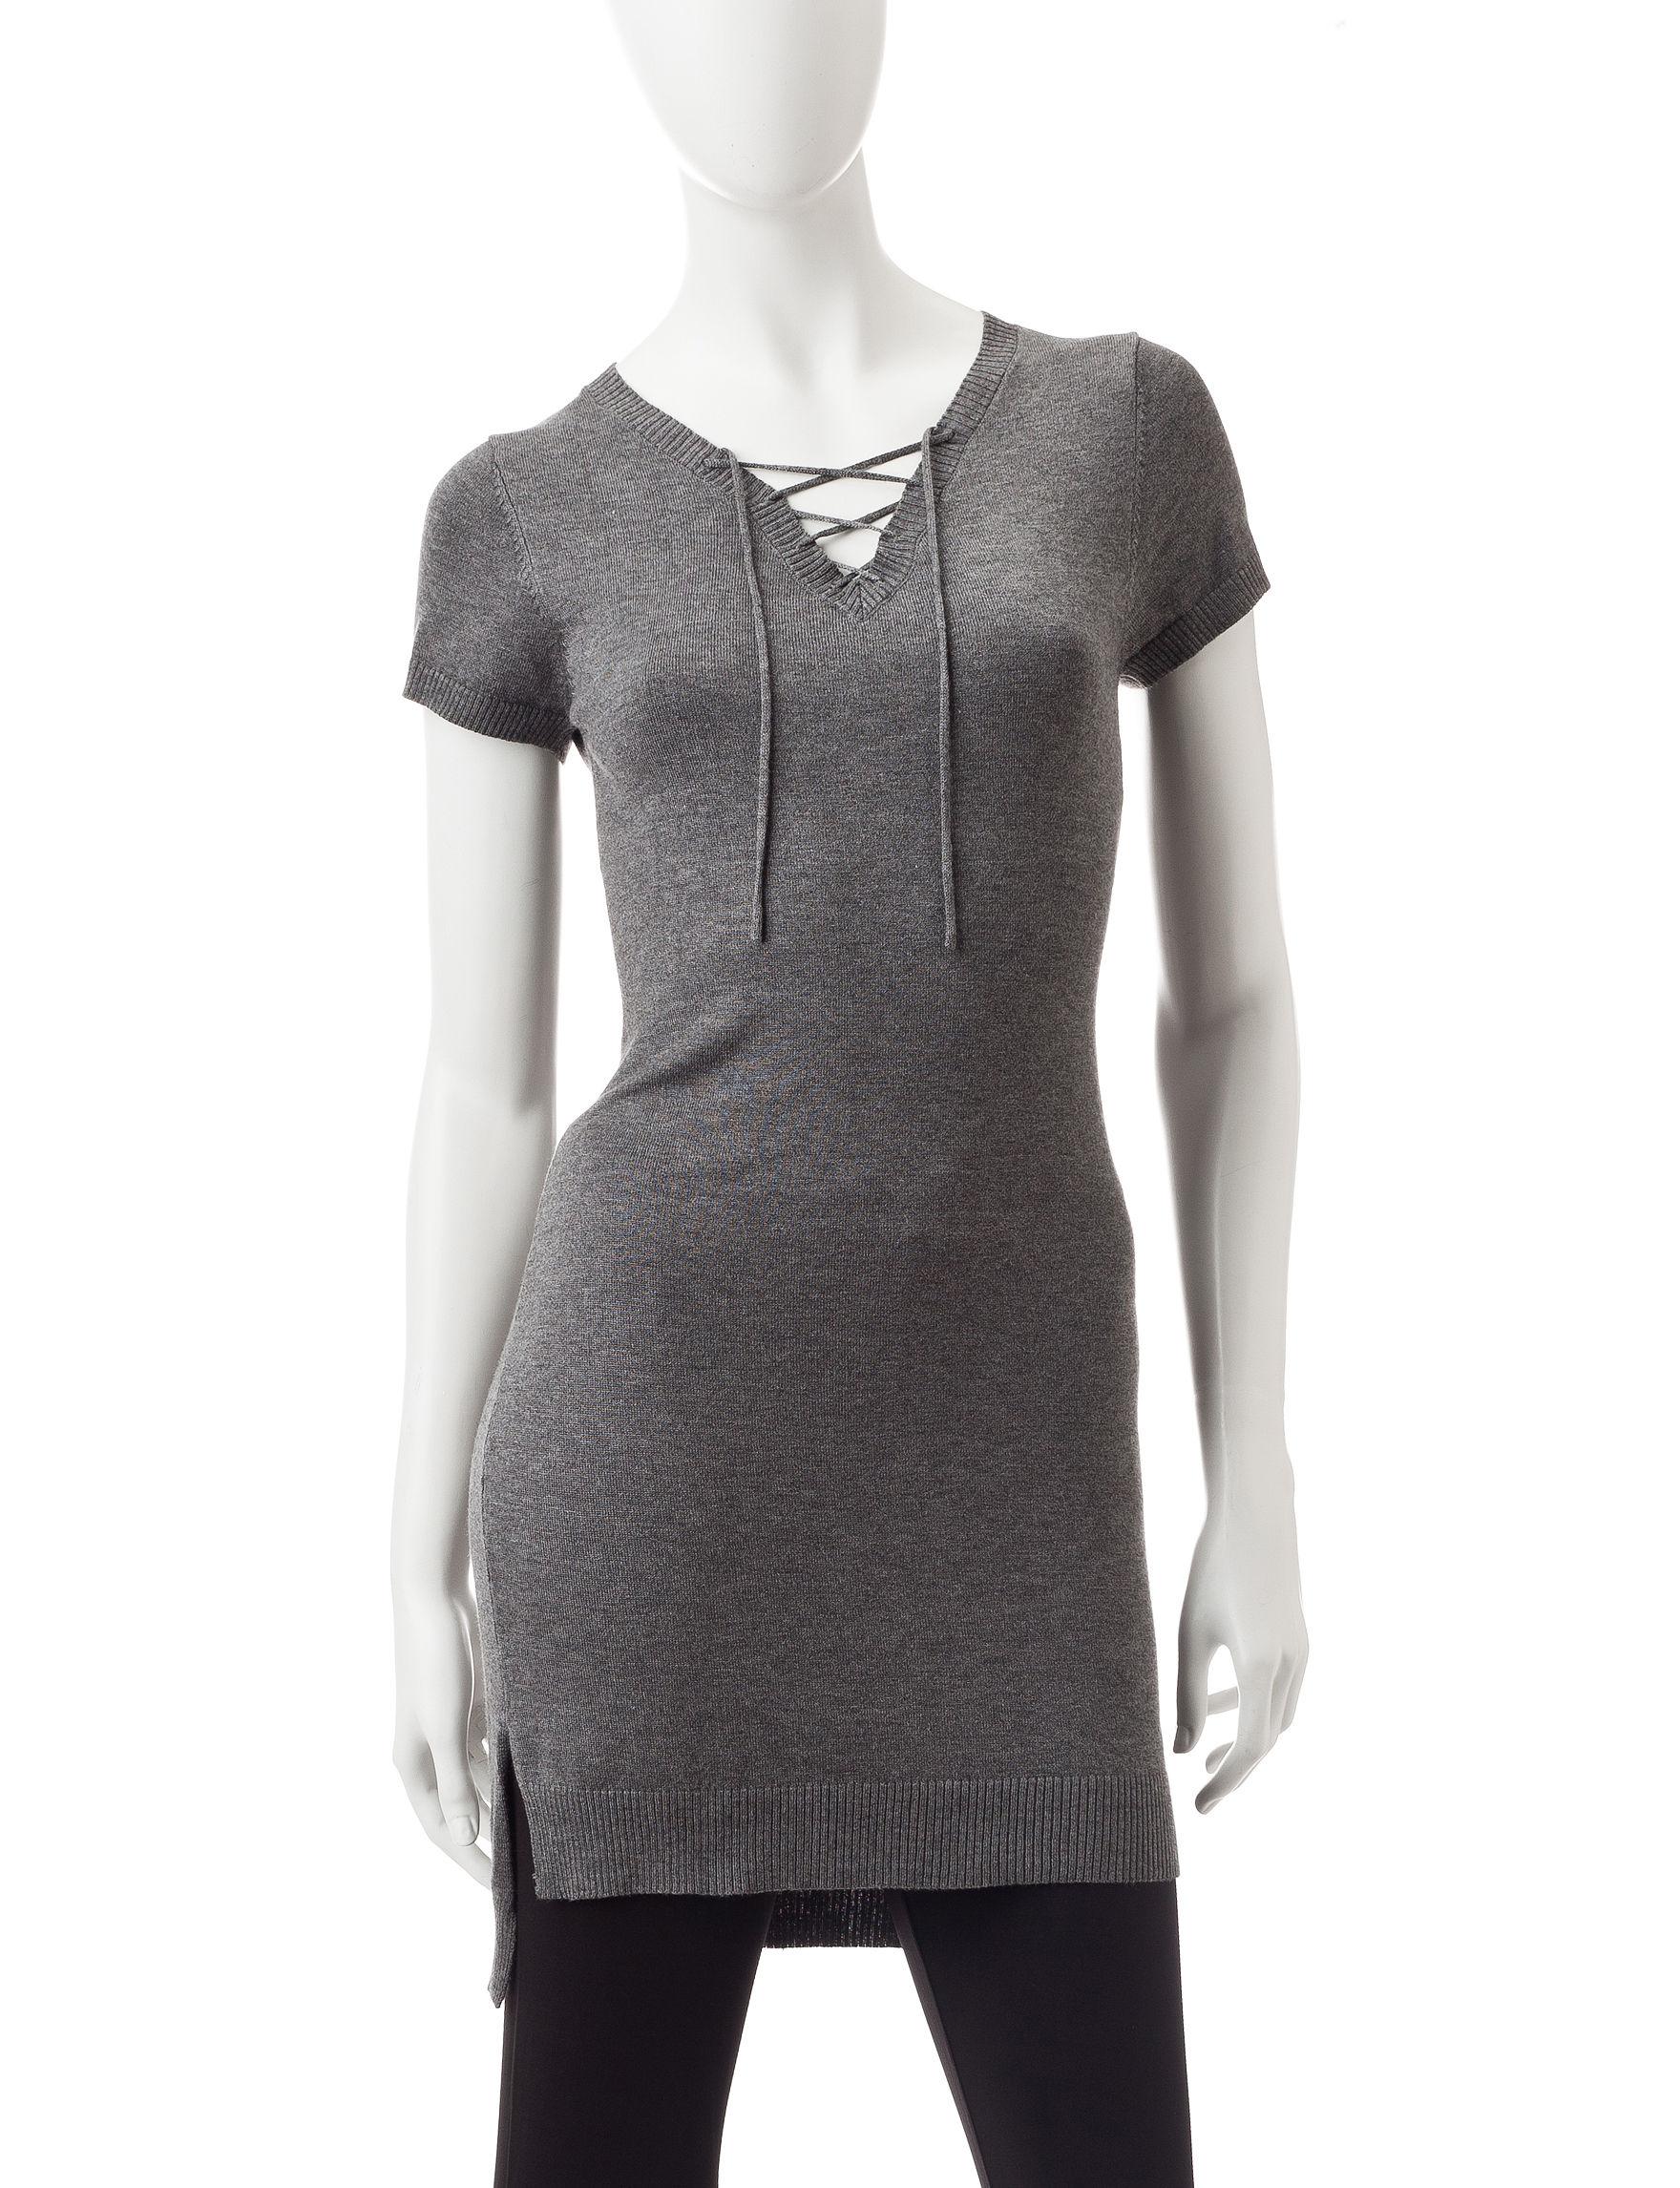 Made for Me to Look Amazing Dark Heather Grey Tunics